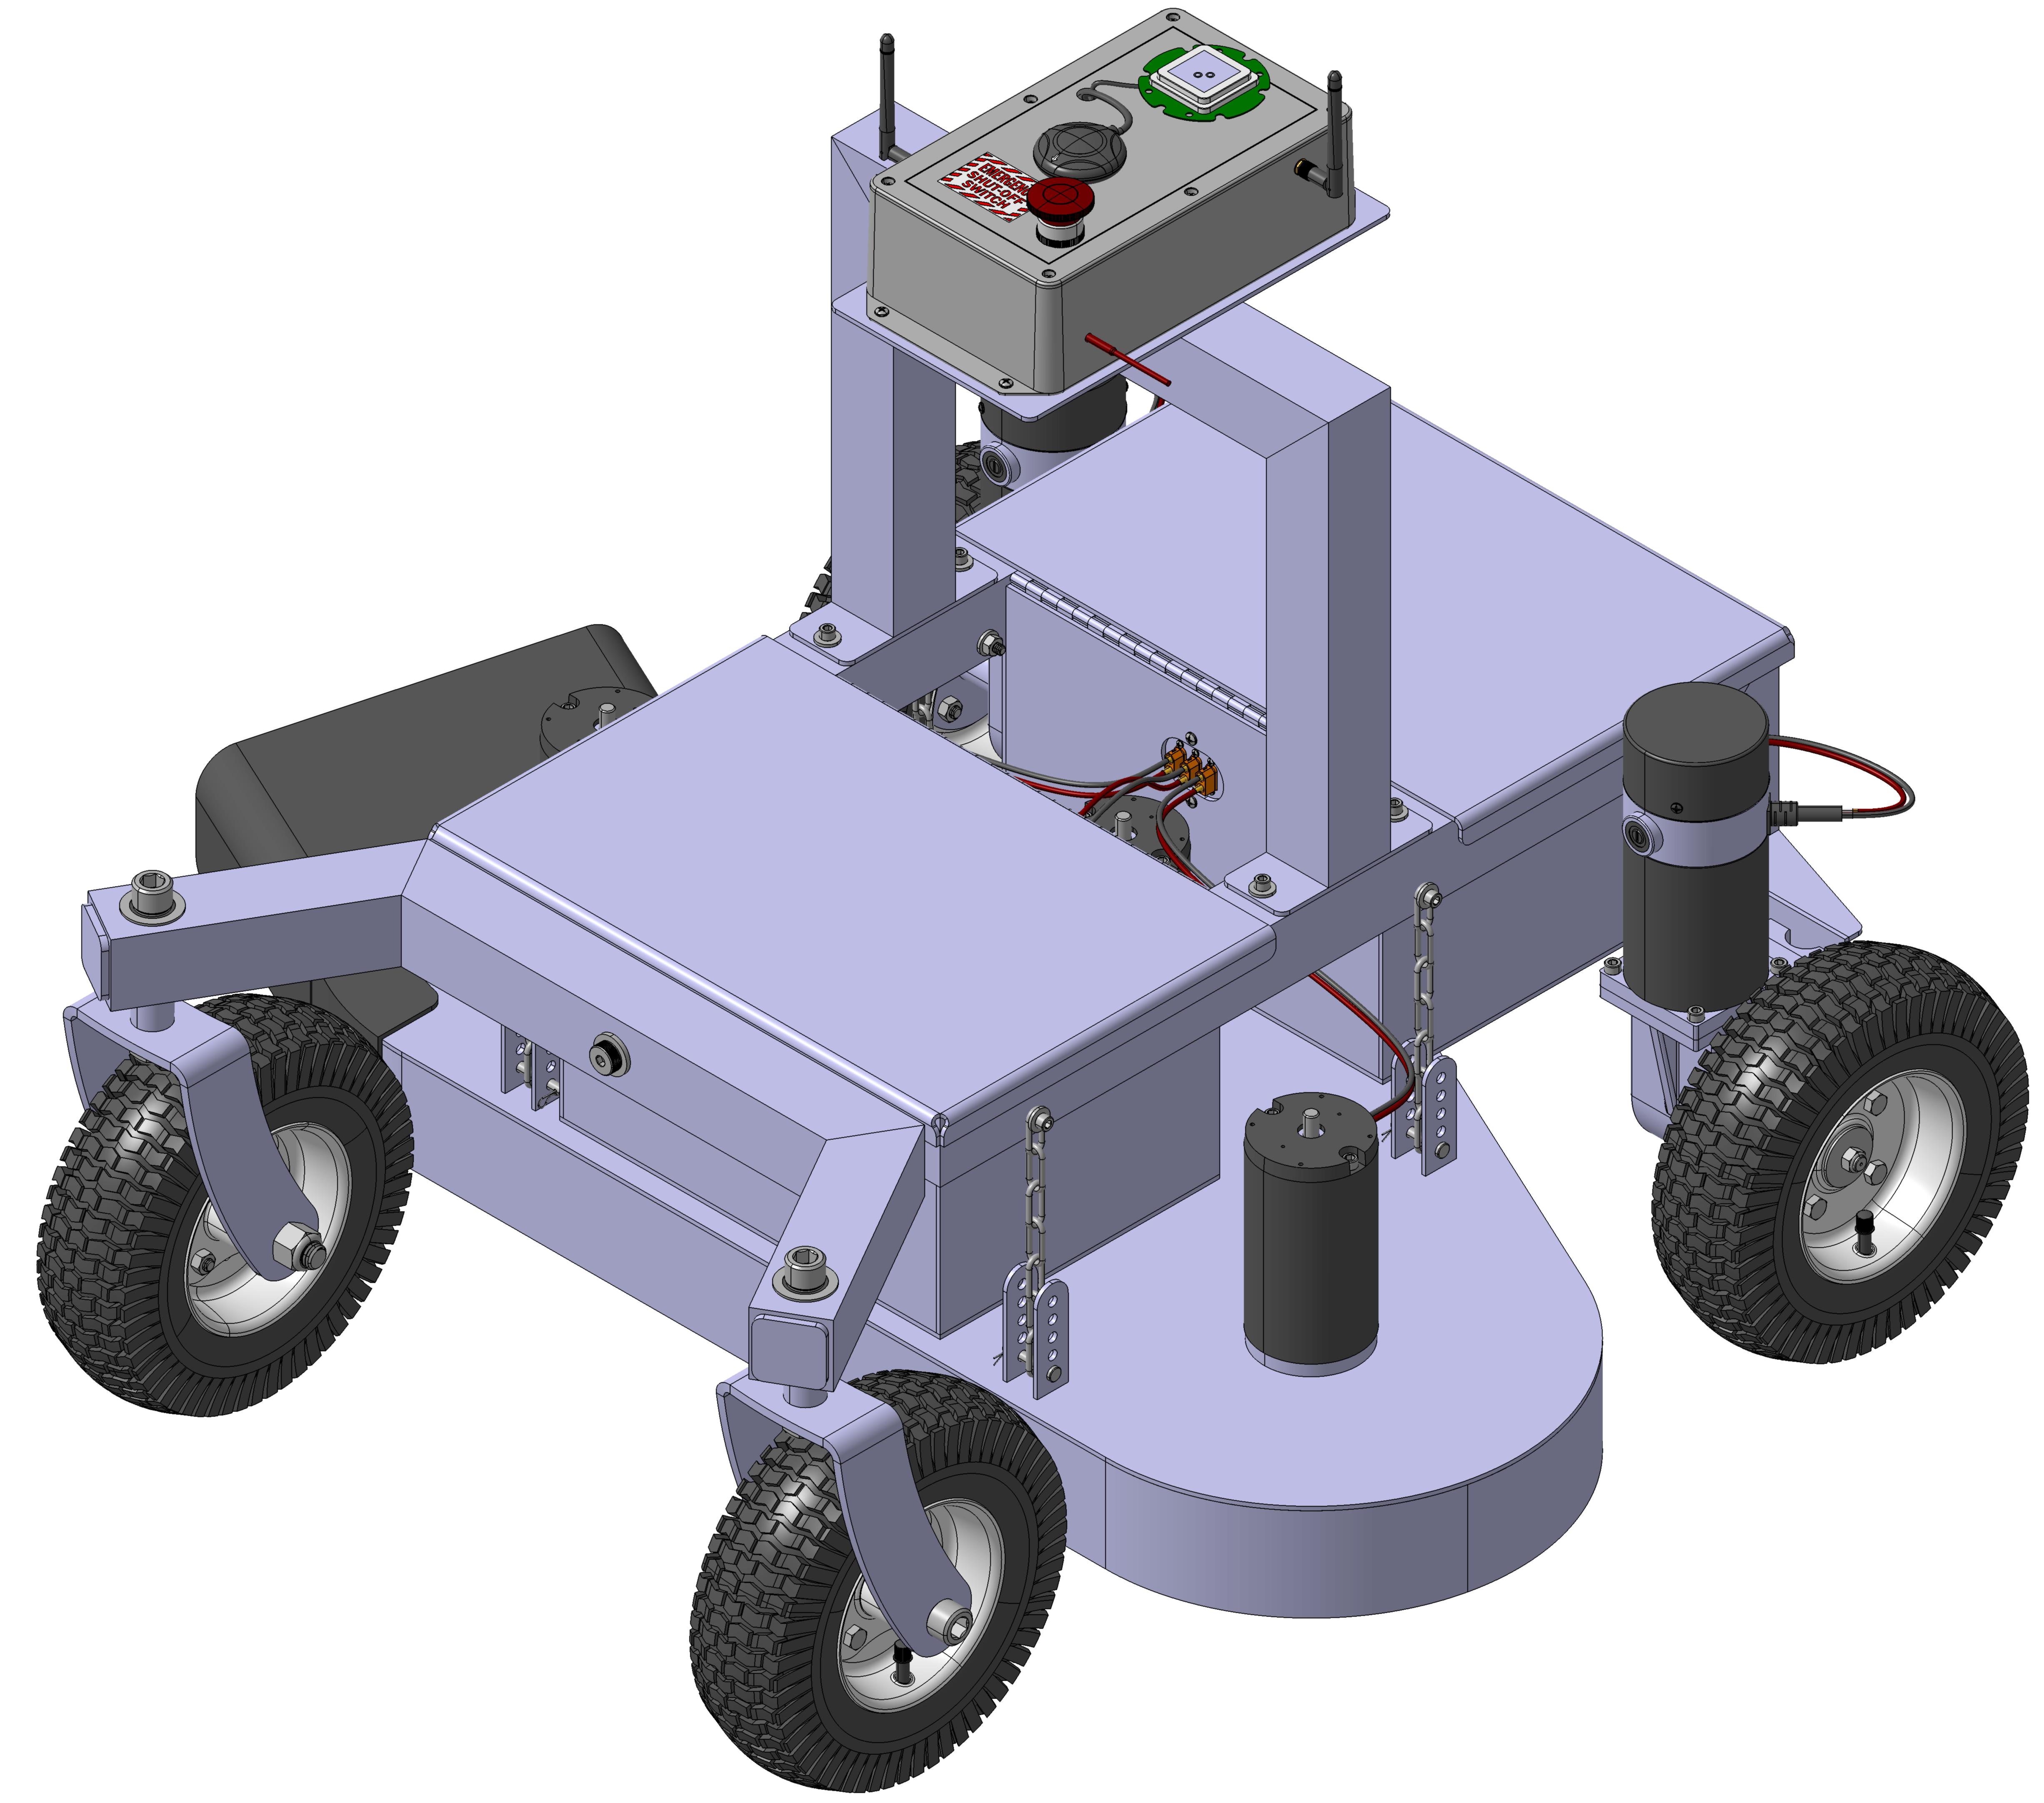 robot-mower-03-03-19.png